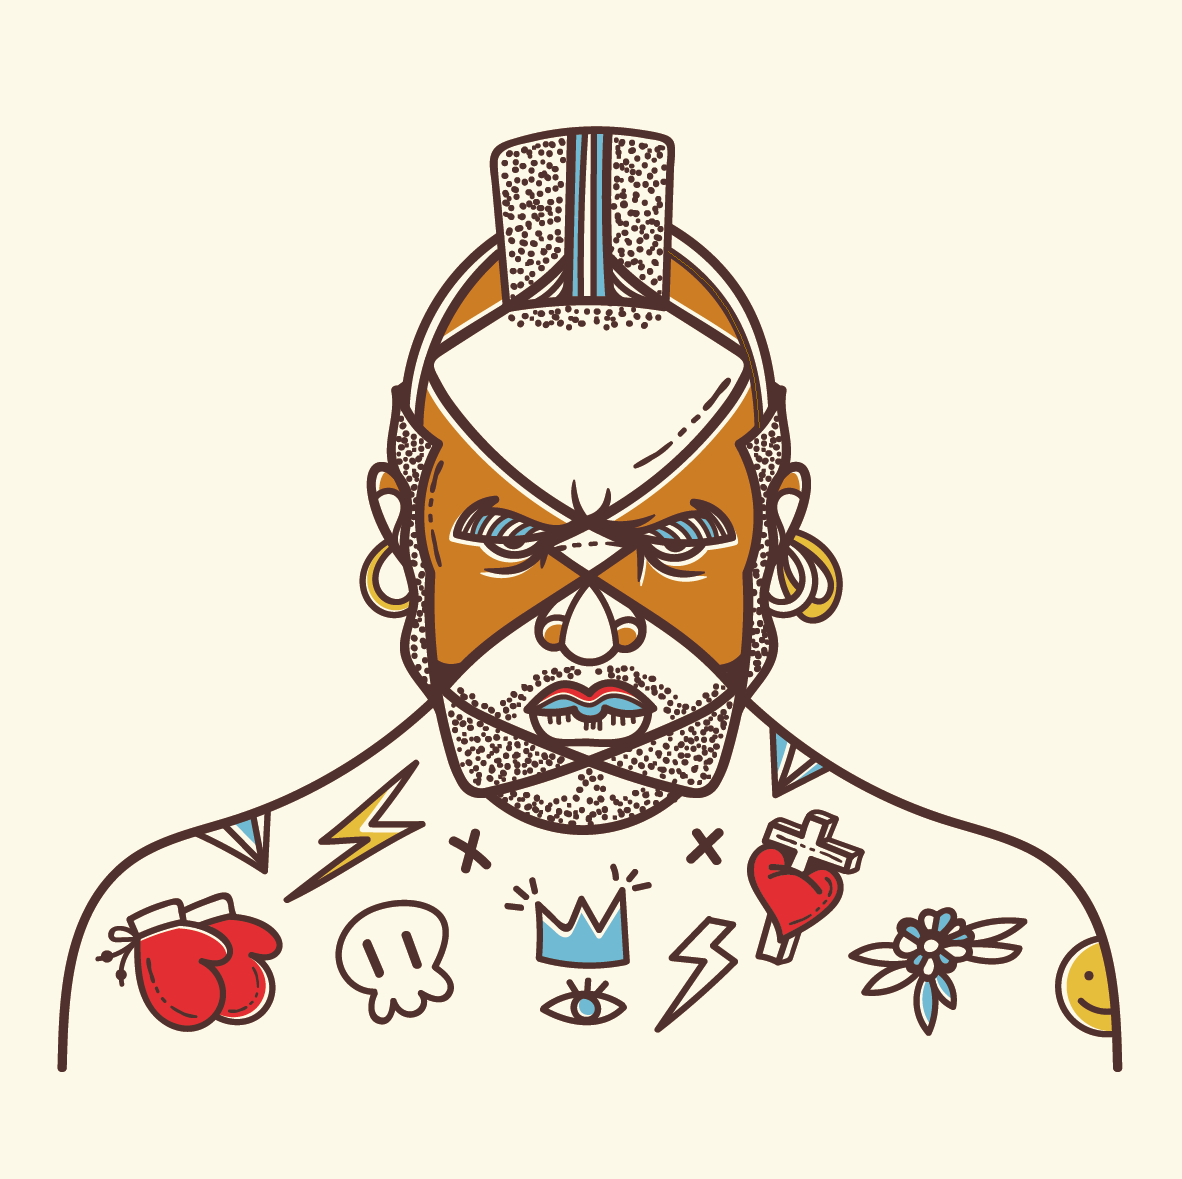 tatuadores espanoles srsleepless 01